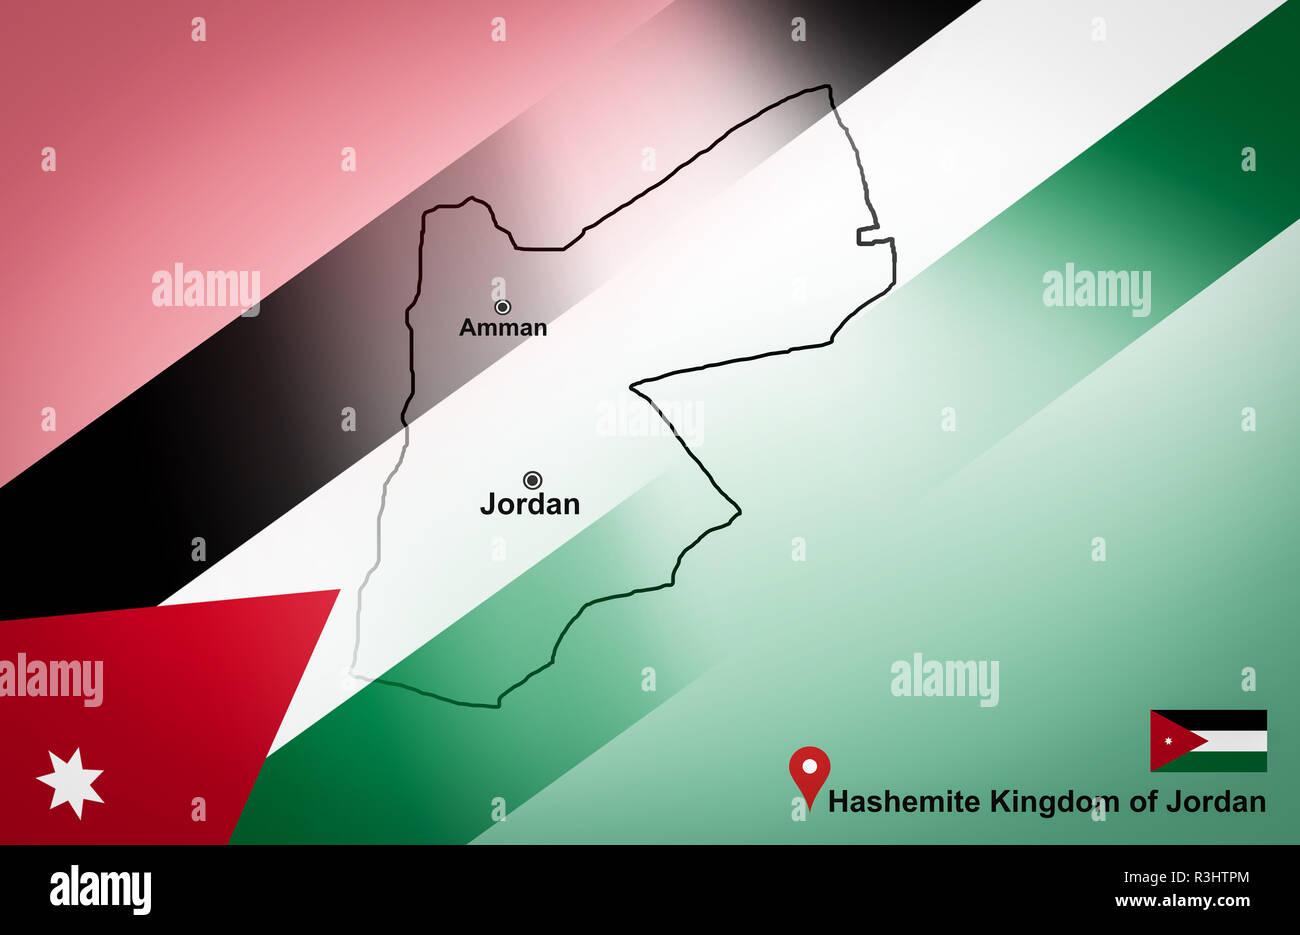 Jordan map and Amman with location map pin and Jordan flag on travel on saudi arabia map, united kingdom map, people's republic of korea map, brazil map, kingdom of moab, papua new guinea map, aqaba jordan map, antigua and barbuda map, hong kong map, the bahamas map, republic of nauru map, iran map, india map, moldova map, united arab emirates map, jordan geography map, amman-jordan map, bermuda map, french wine map,